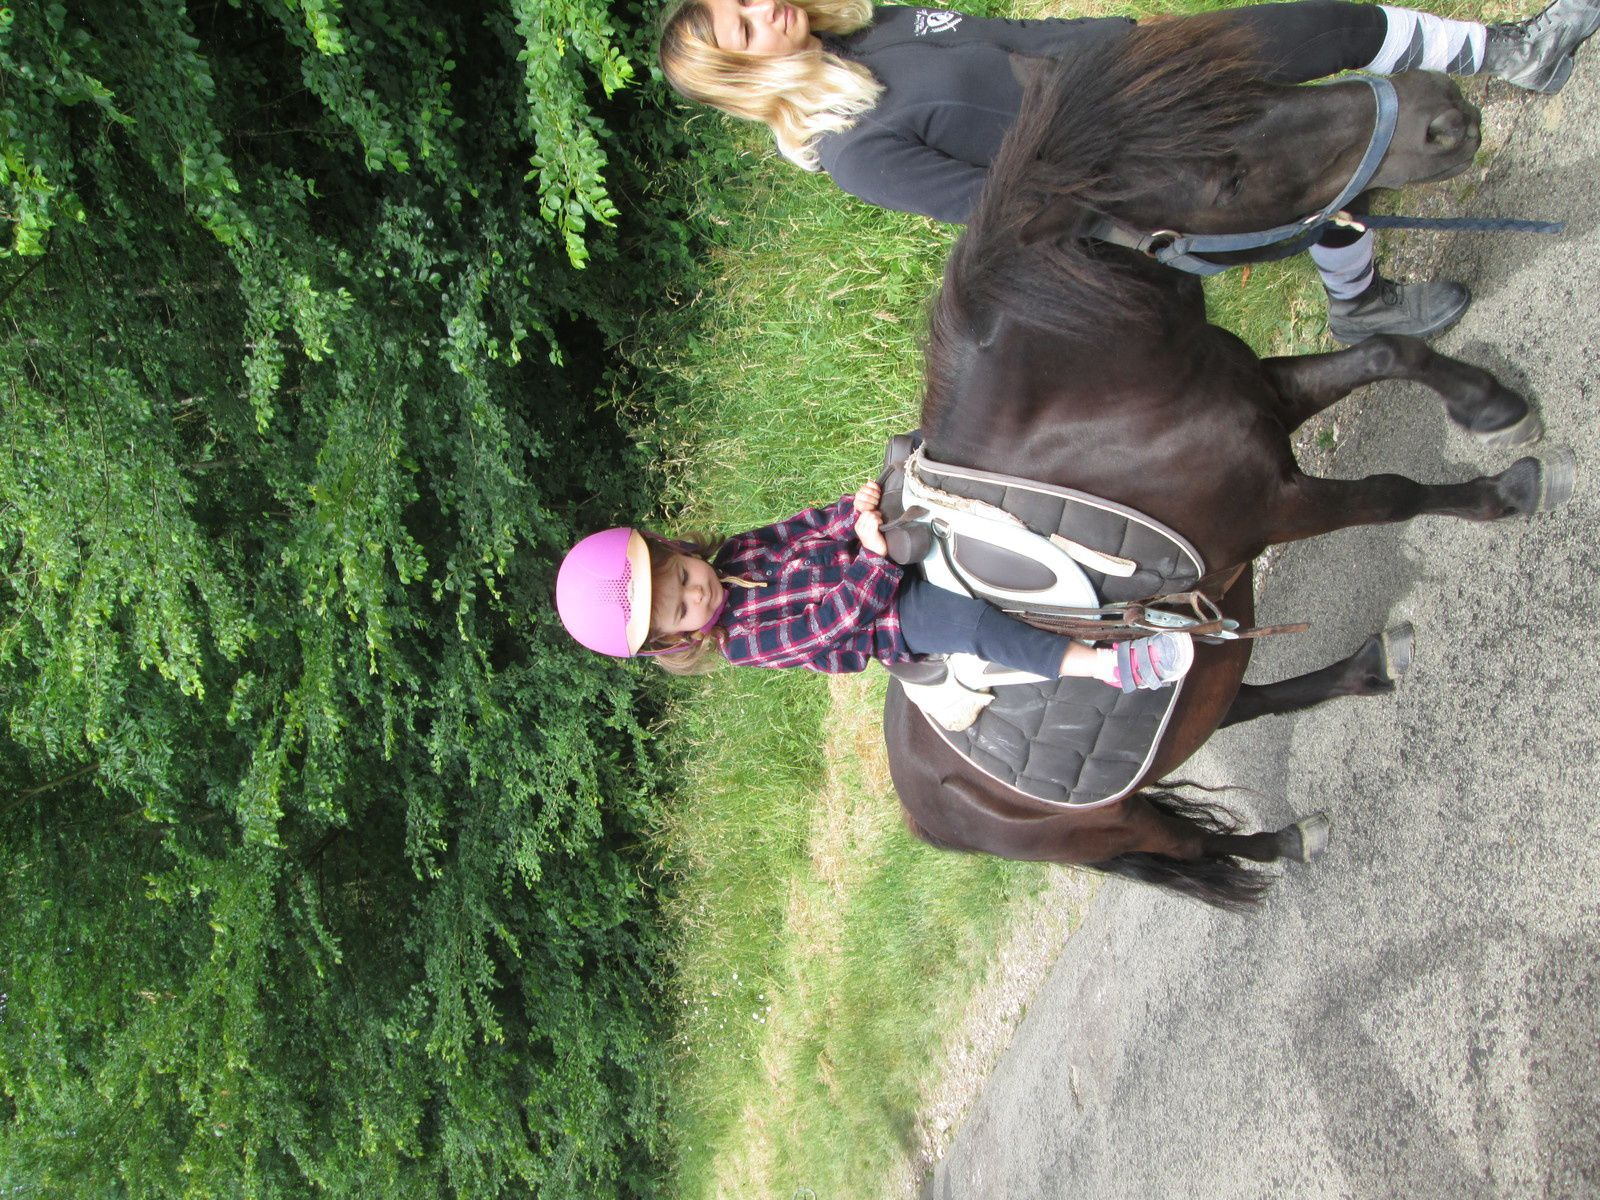 balade a poneys a l'association Lagrange de Limésy